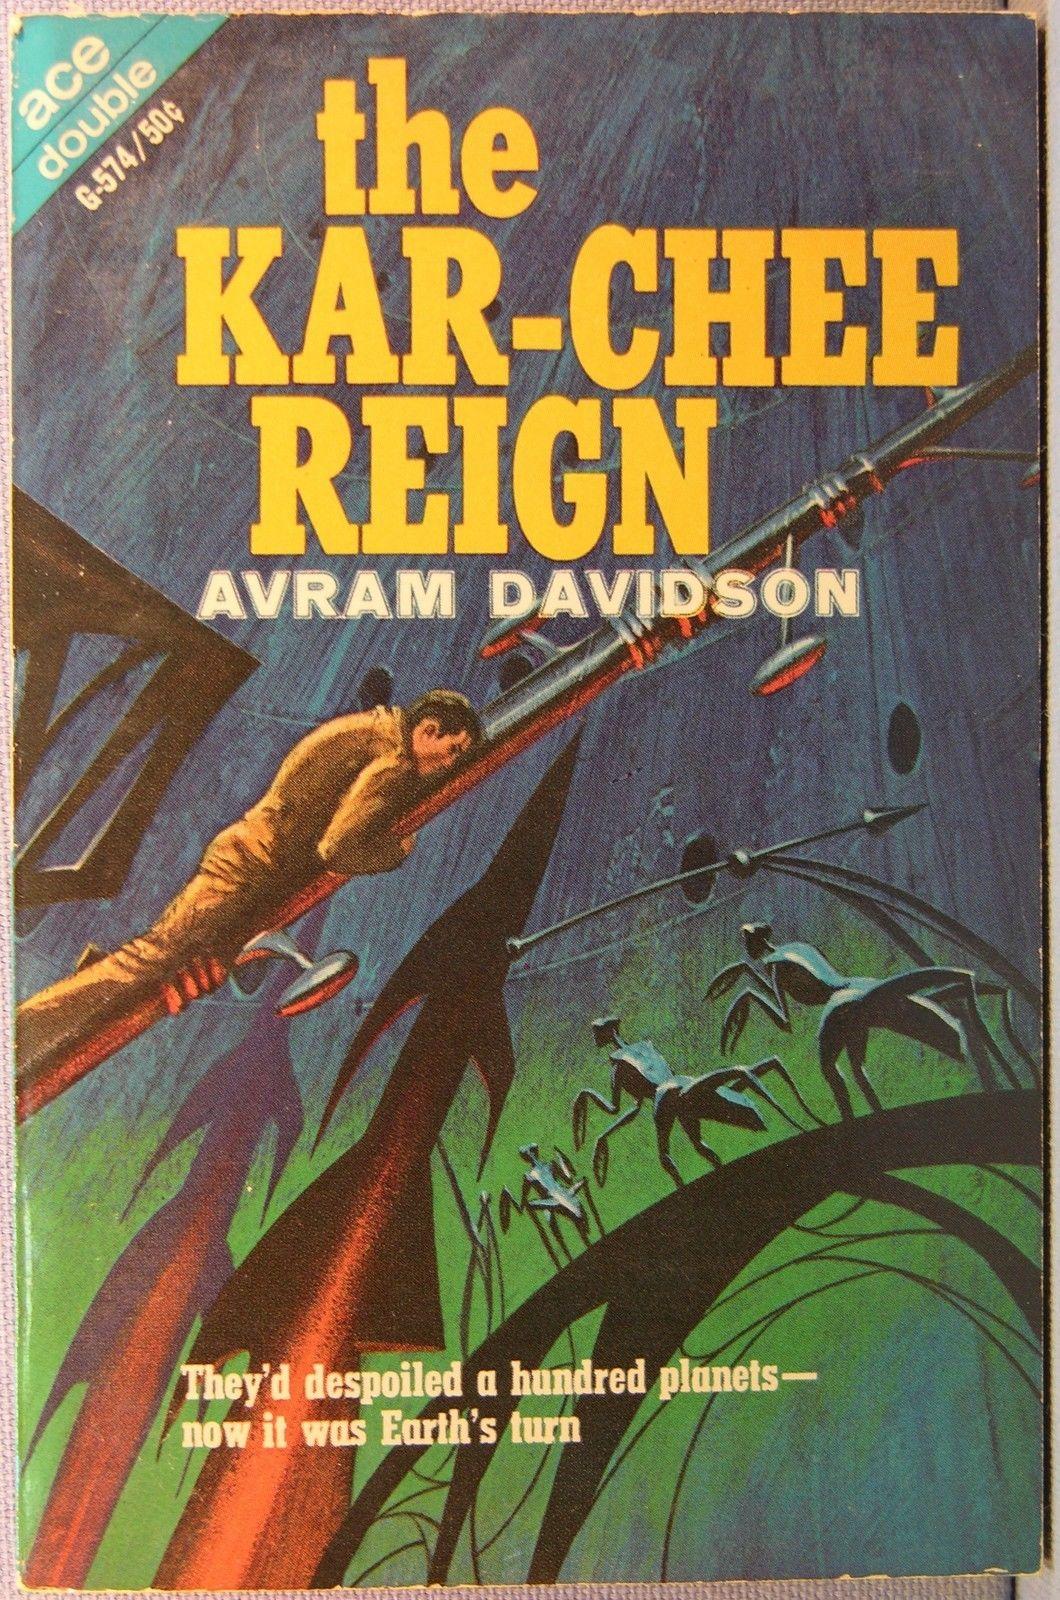 The Kar-Chee Reign